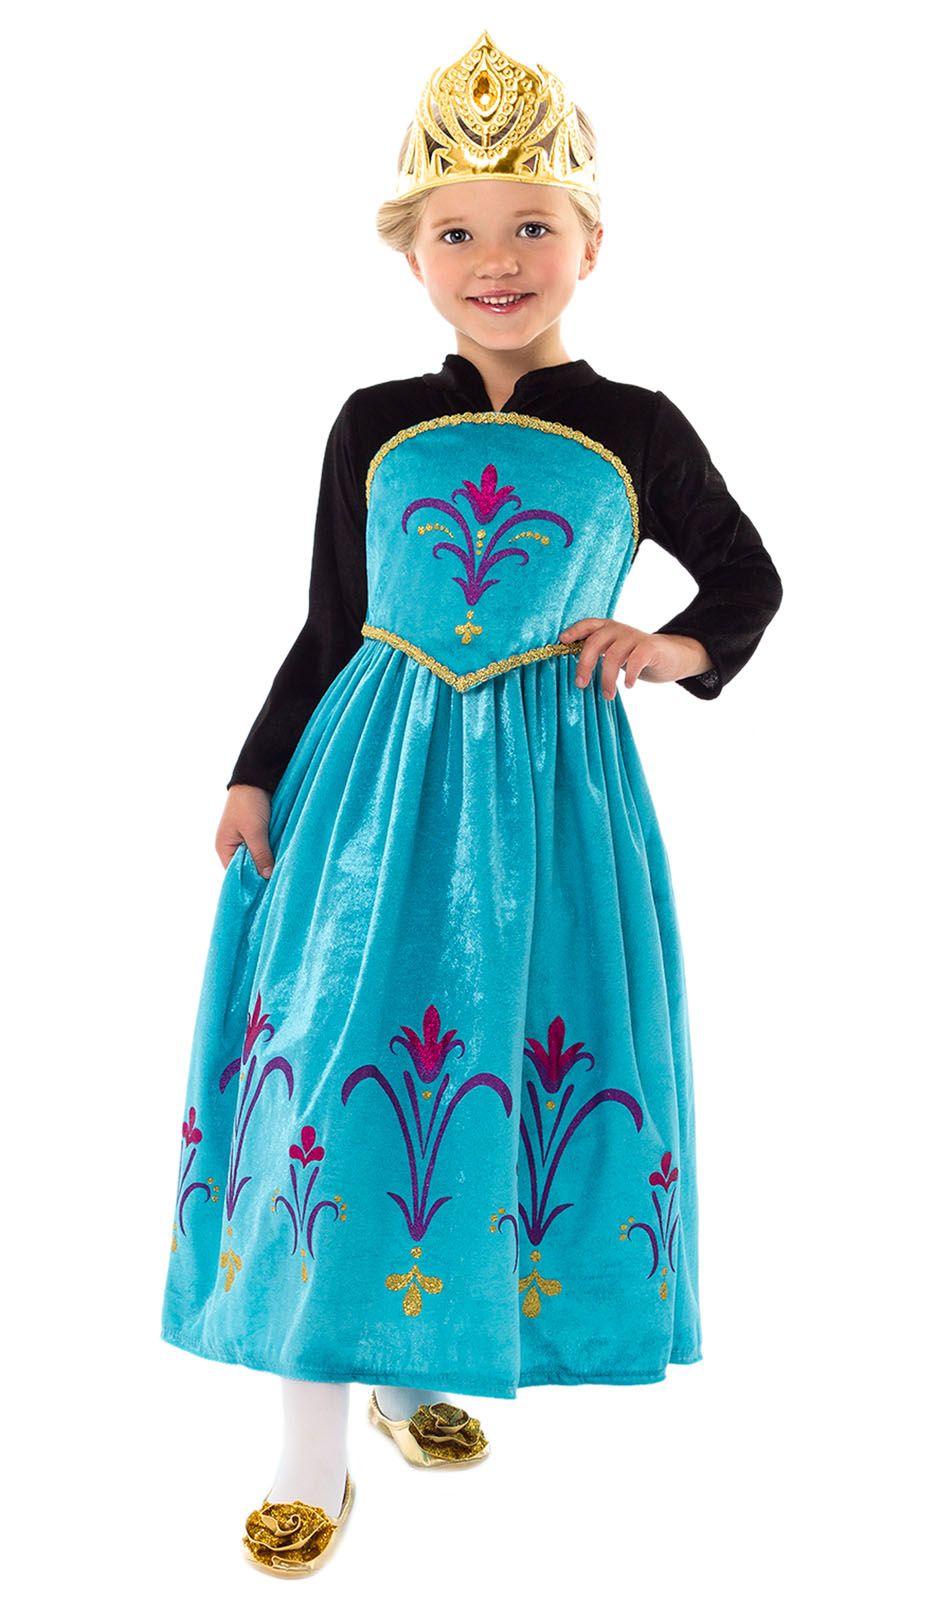 Elsa Inspired Coronation Dress | Princess tea party | Pinterest ...